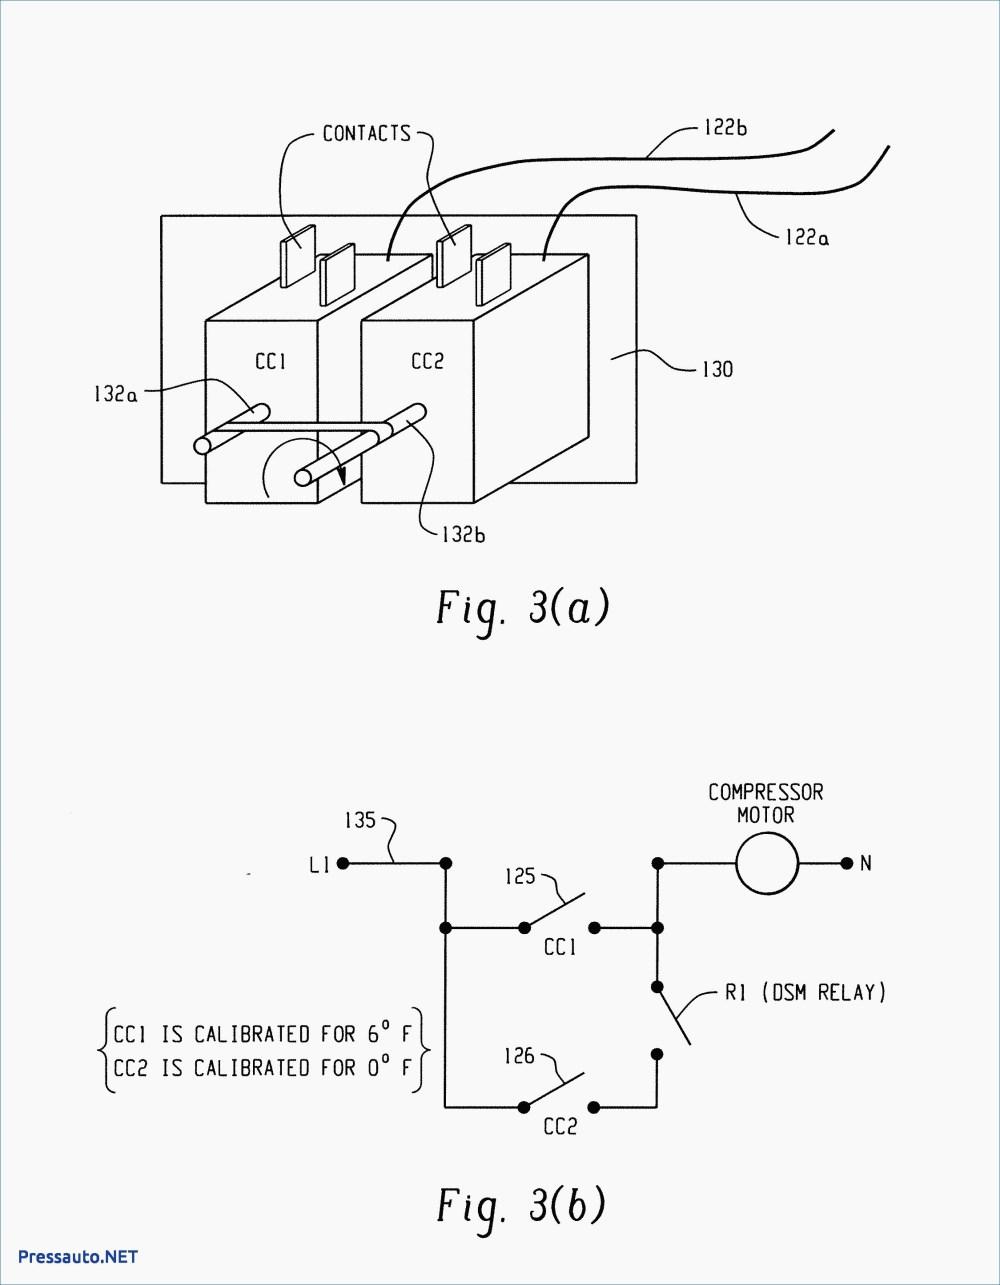 medium resolution of 2 wire pressure transducer wiring diagram 3 wire pressure transducer wiring diagram luxury series 2